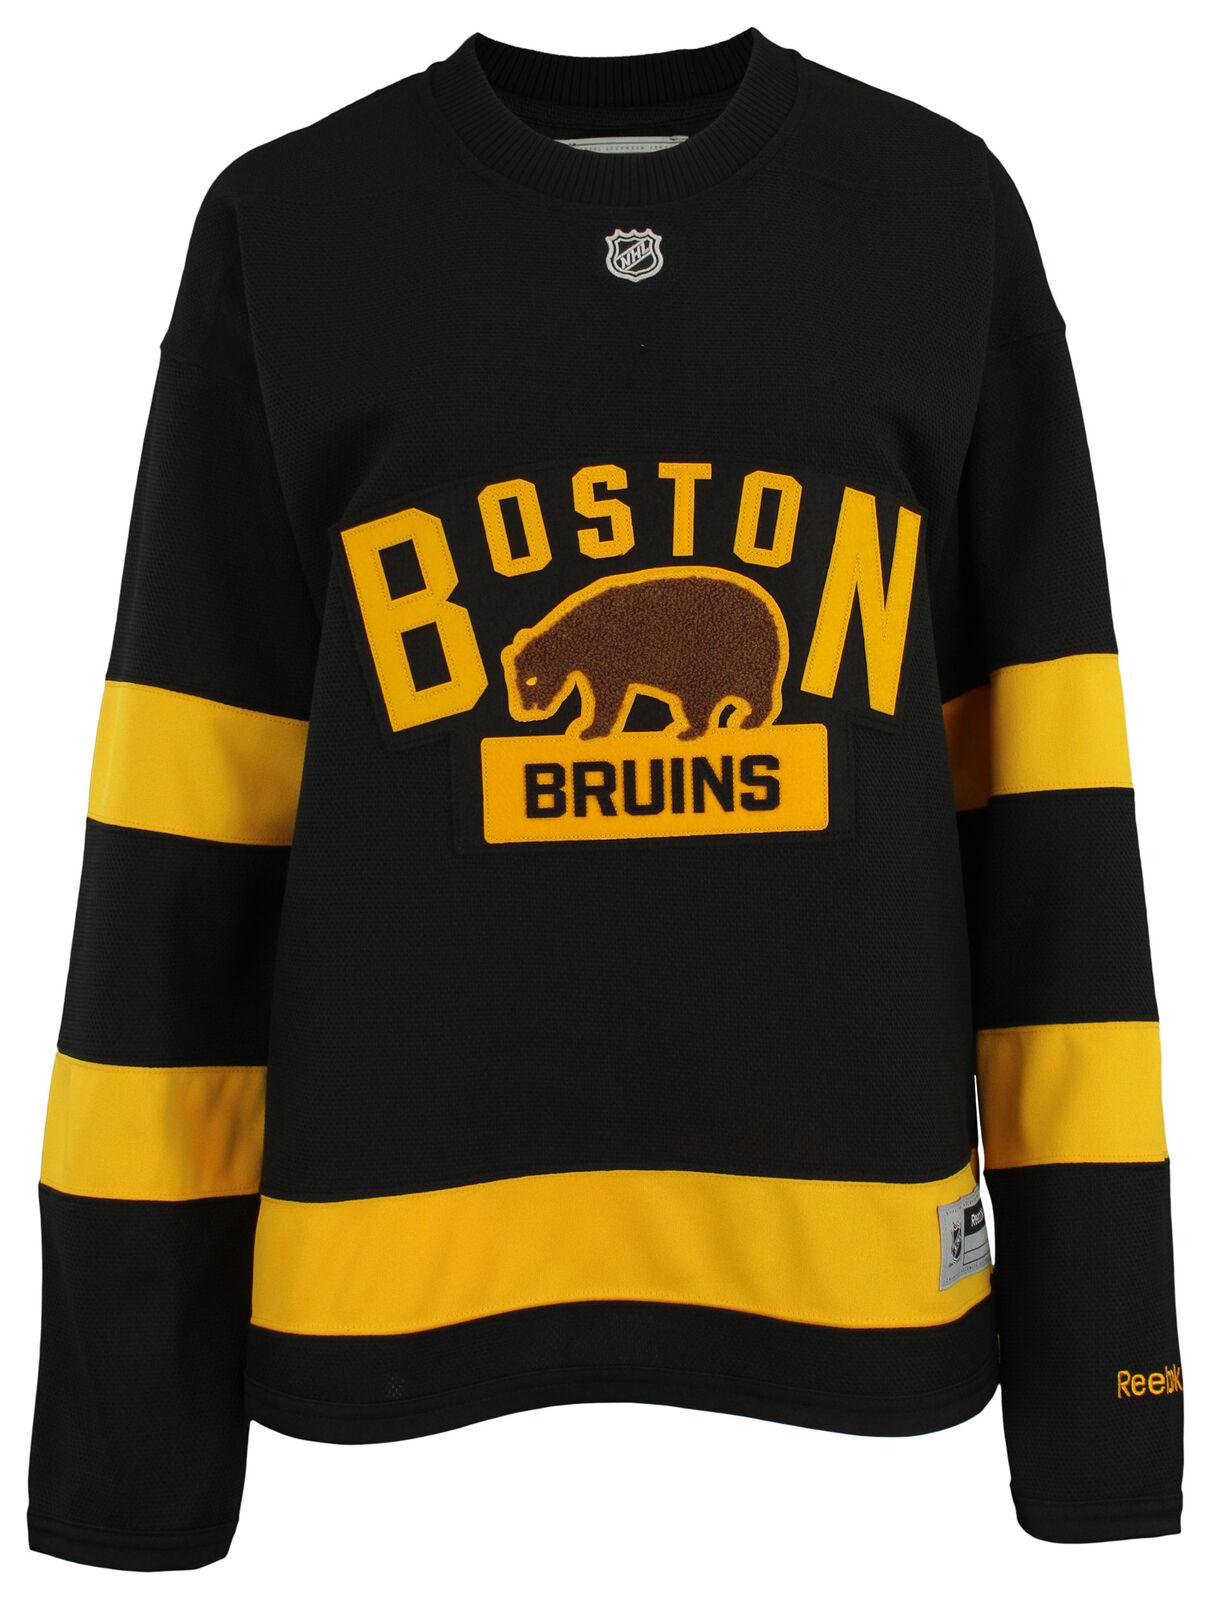 Reebok Boston Bruins NHL Women's Alternate Premier Jersey, Black